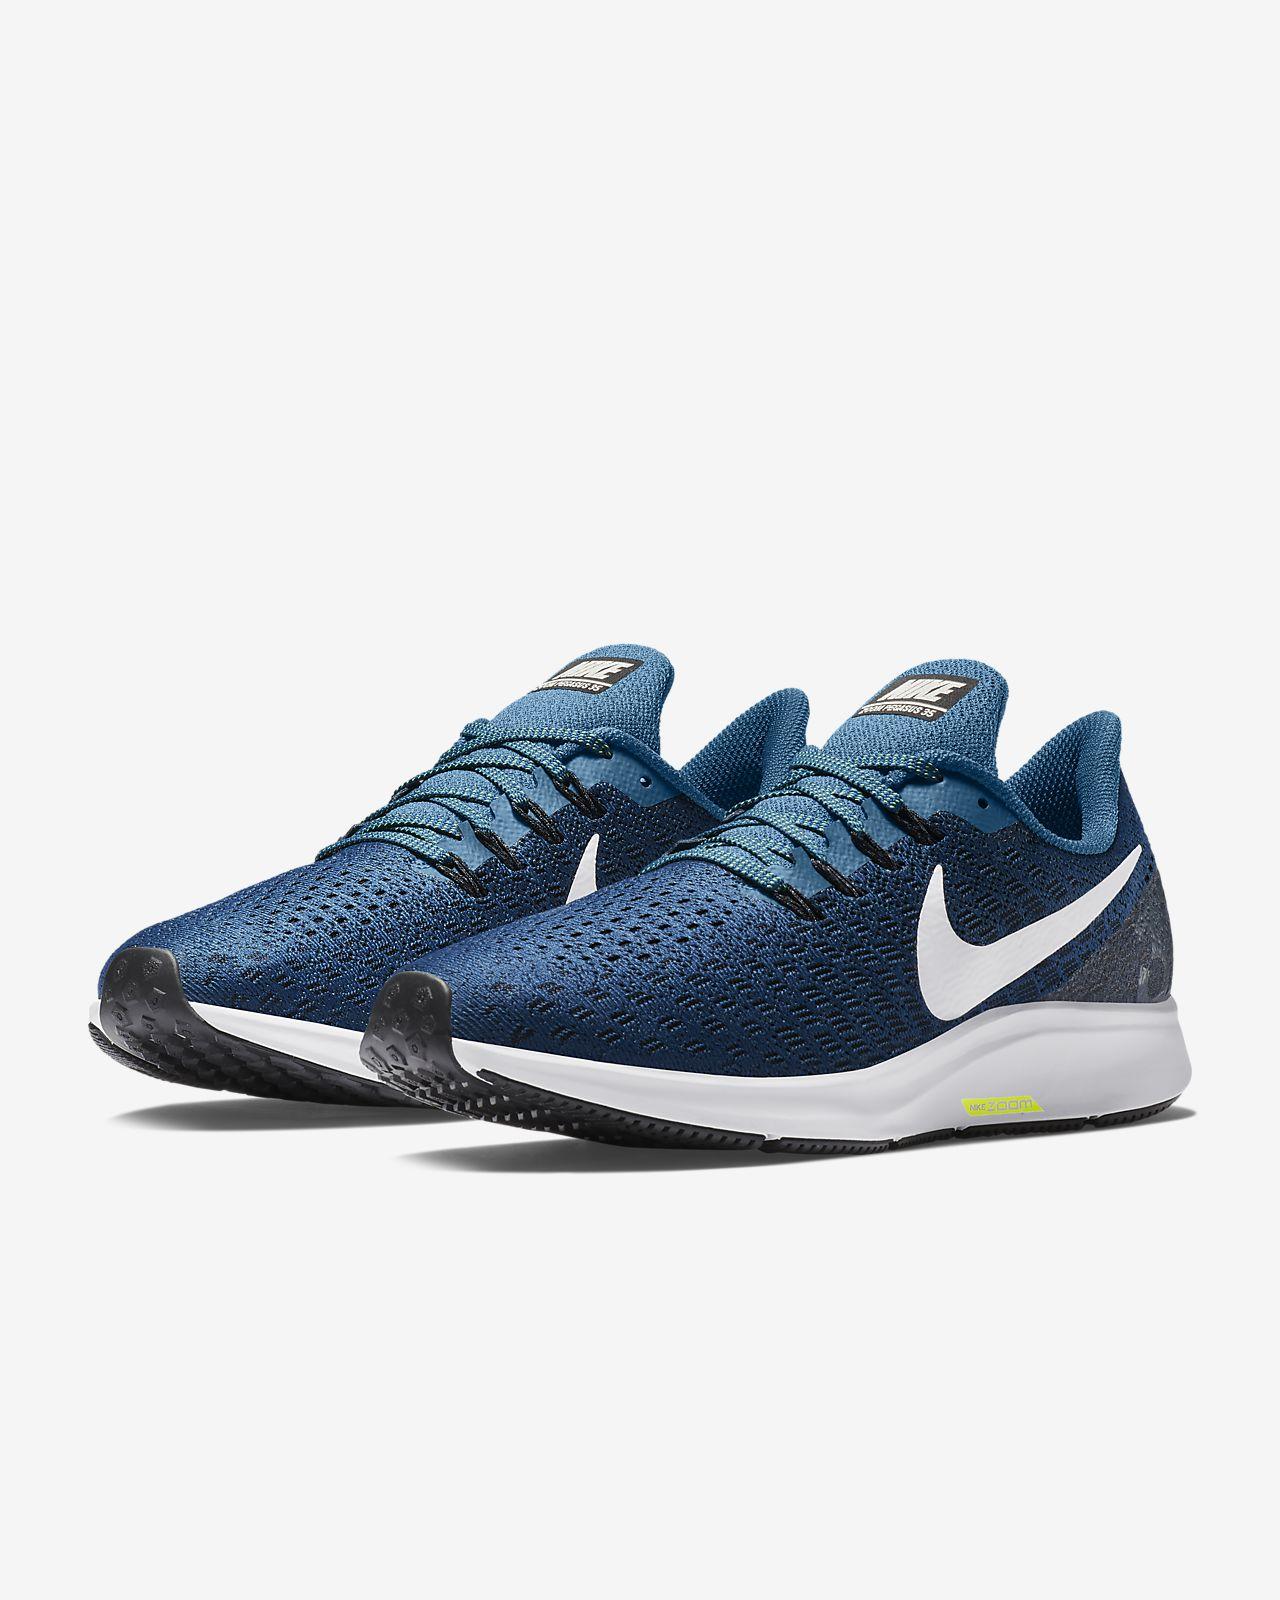 promo code 2d0eb ca7b9 ... Chaussure de running Nike Air Zoom Pegasus 35 pour Homme